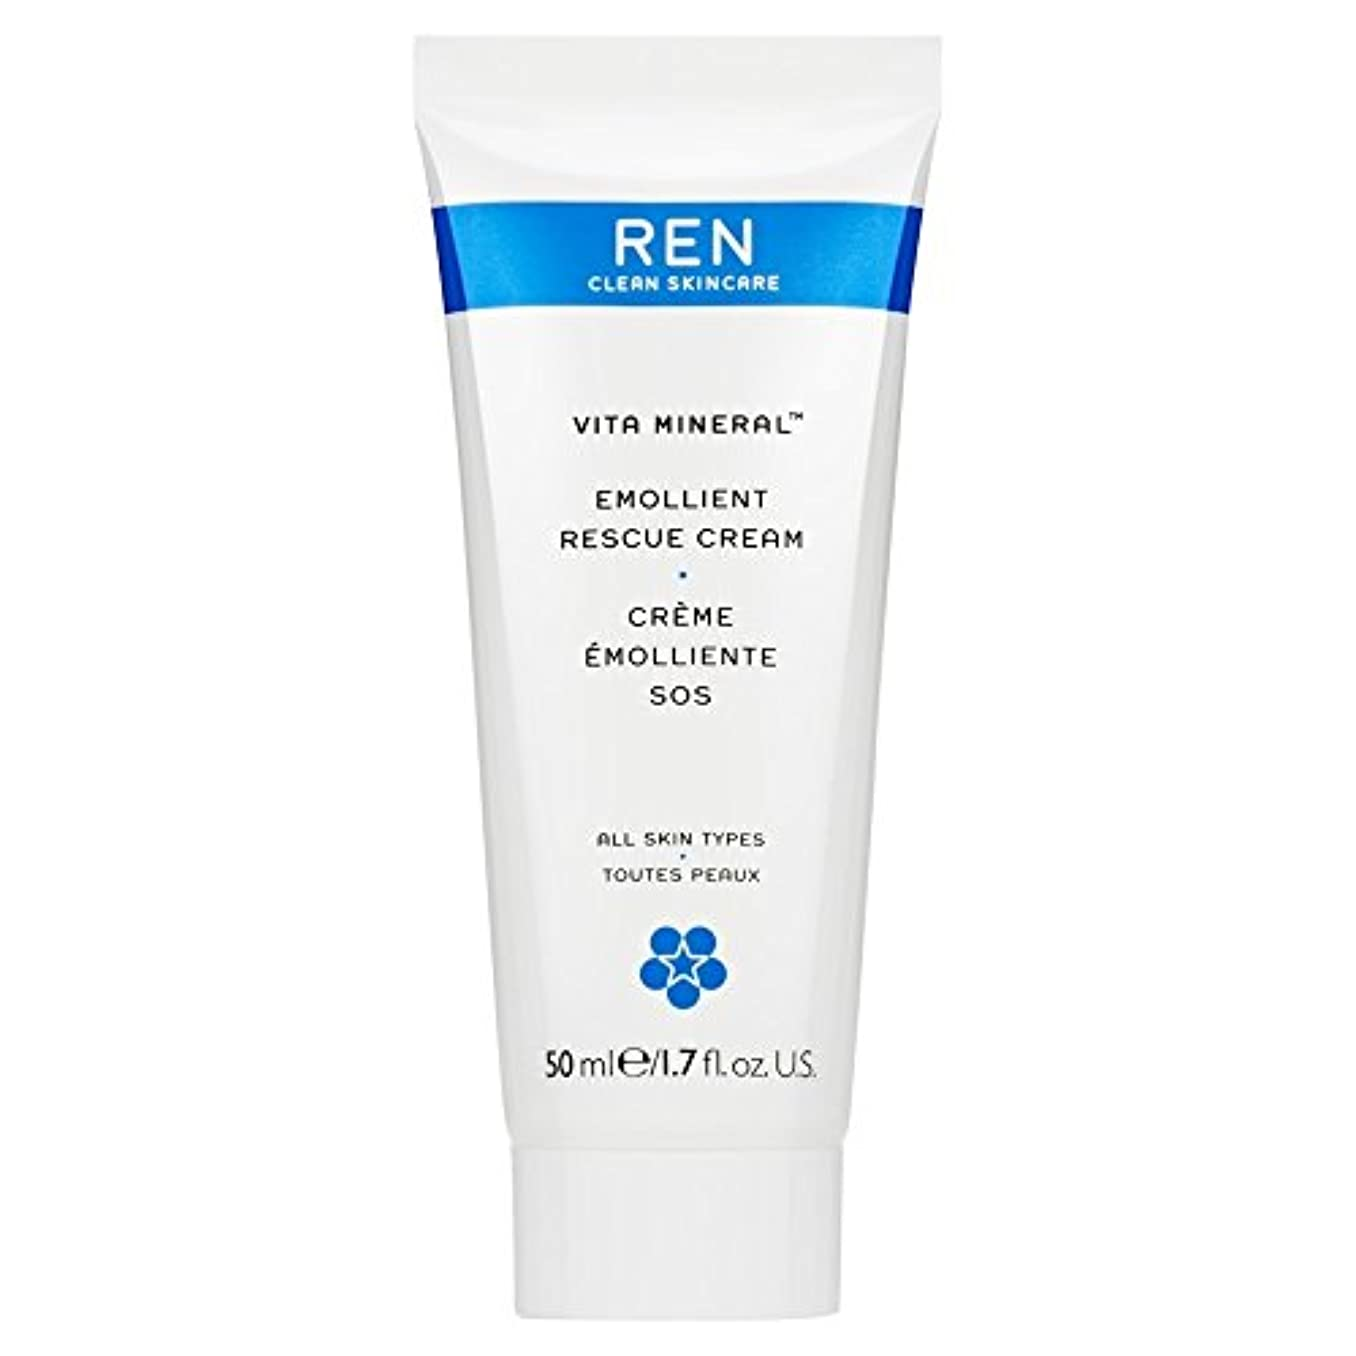 Renヴィータミネラルレスキュークリーム、50ミリリットル (REN) (x2) - REN Vita Mineral Rescue Cream, 50ml (Pack of 2) [並行輸入品]